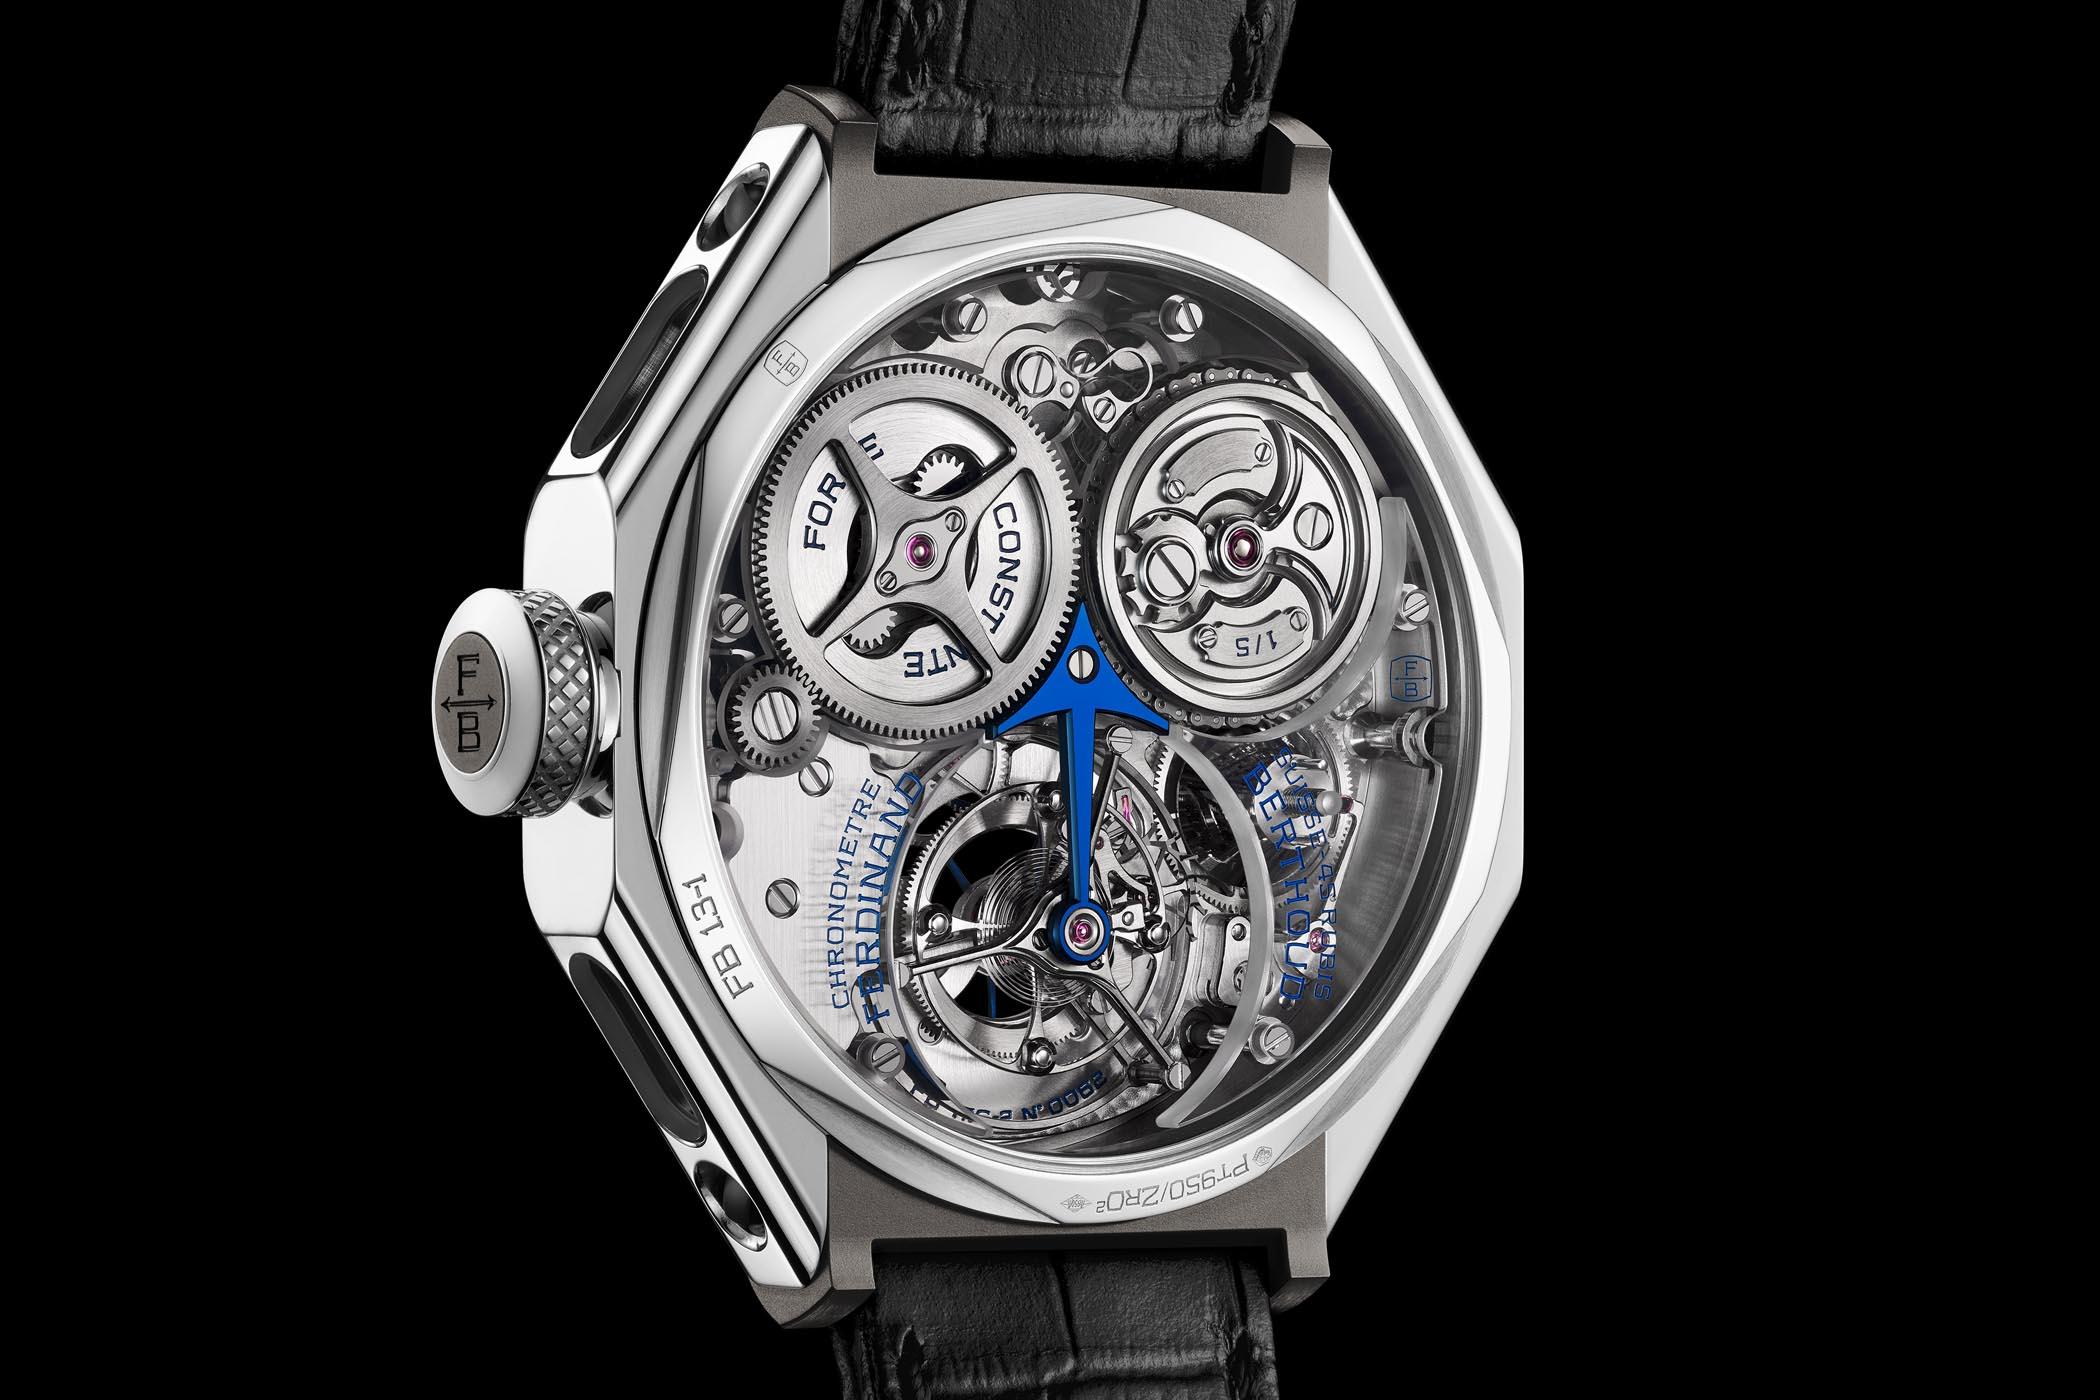 https://k8q7r7a2.stackpathcdn.com/wp-content/uploads/2019/11/Ferdinand-Berthoud-FB-1.3-1-Sapphire-Blue-Chronometer-6.jpg